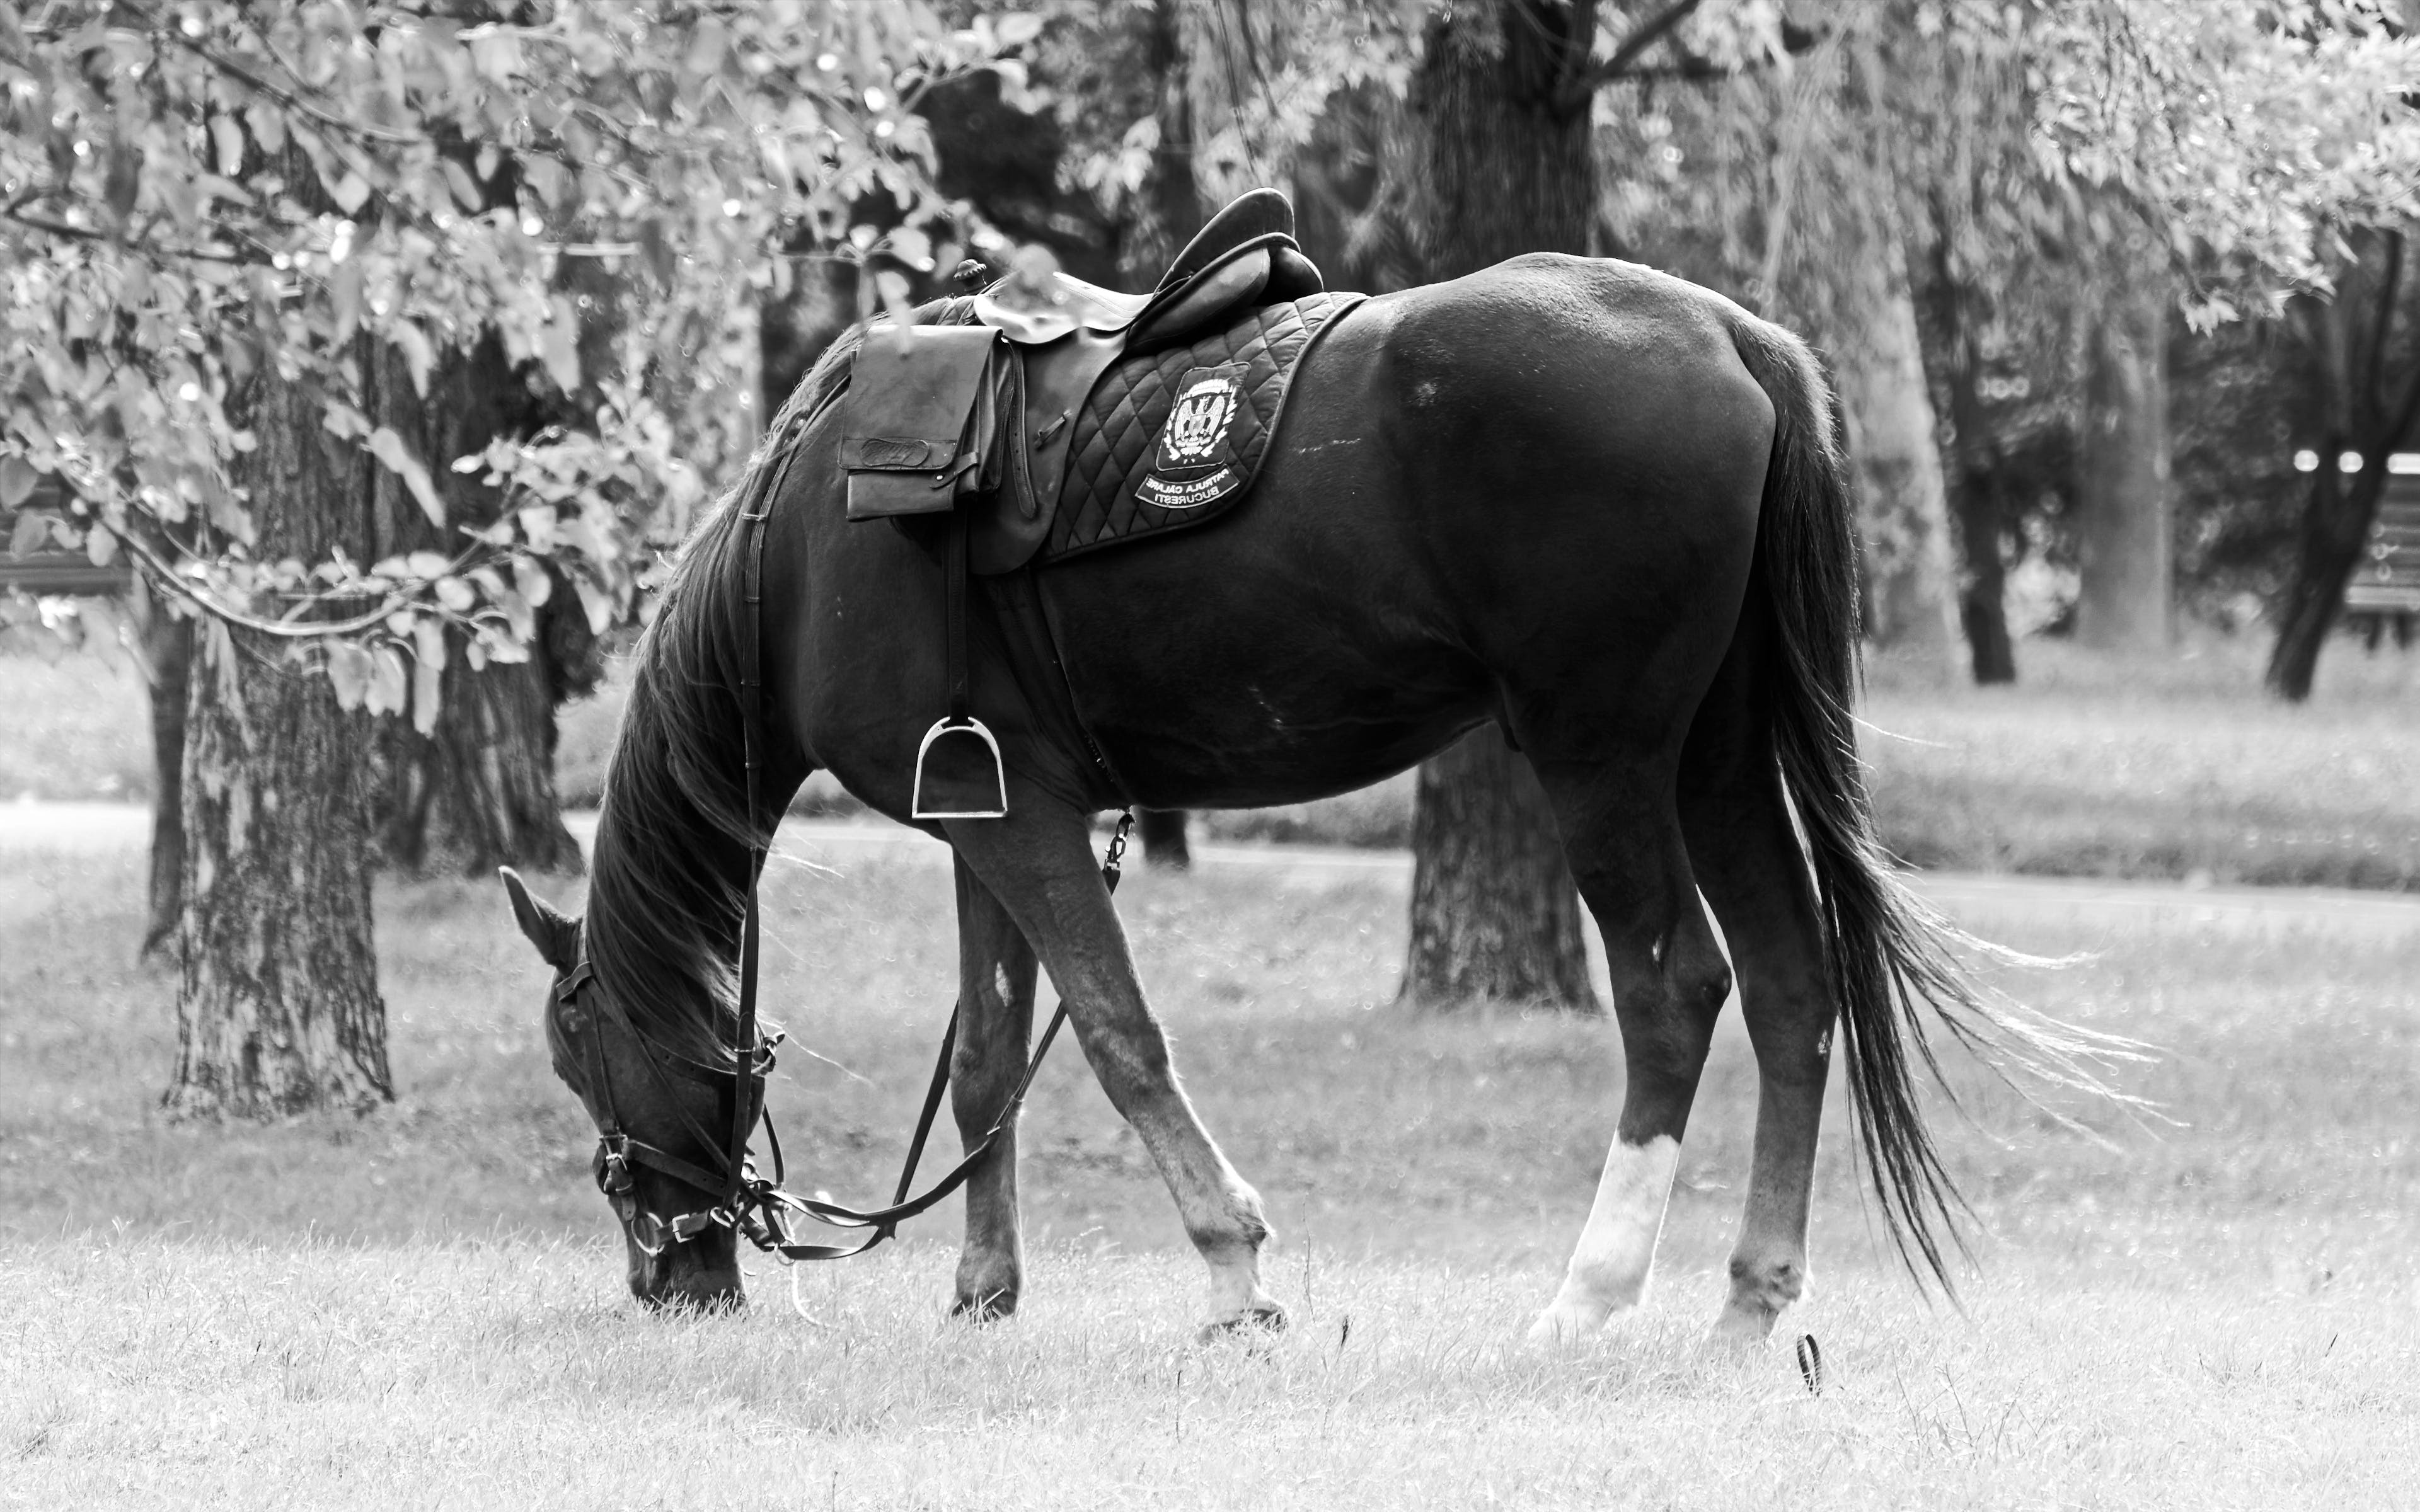 Free stock photo of animal, black and white, horse, nature